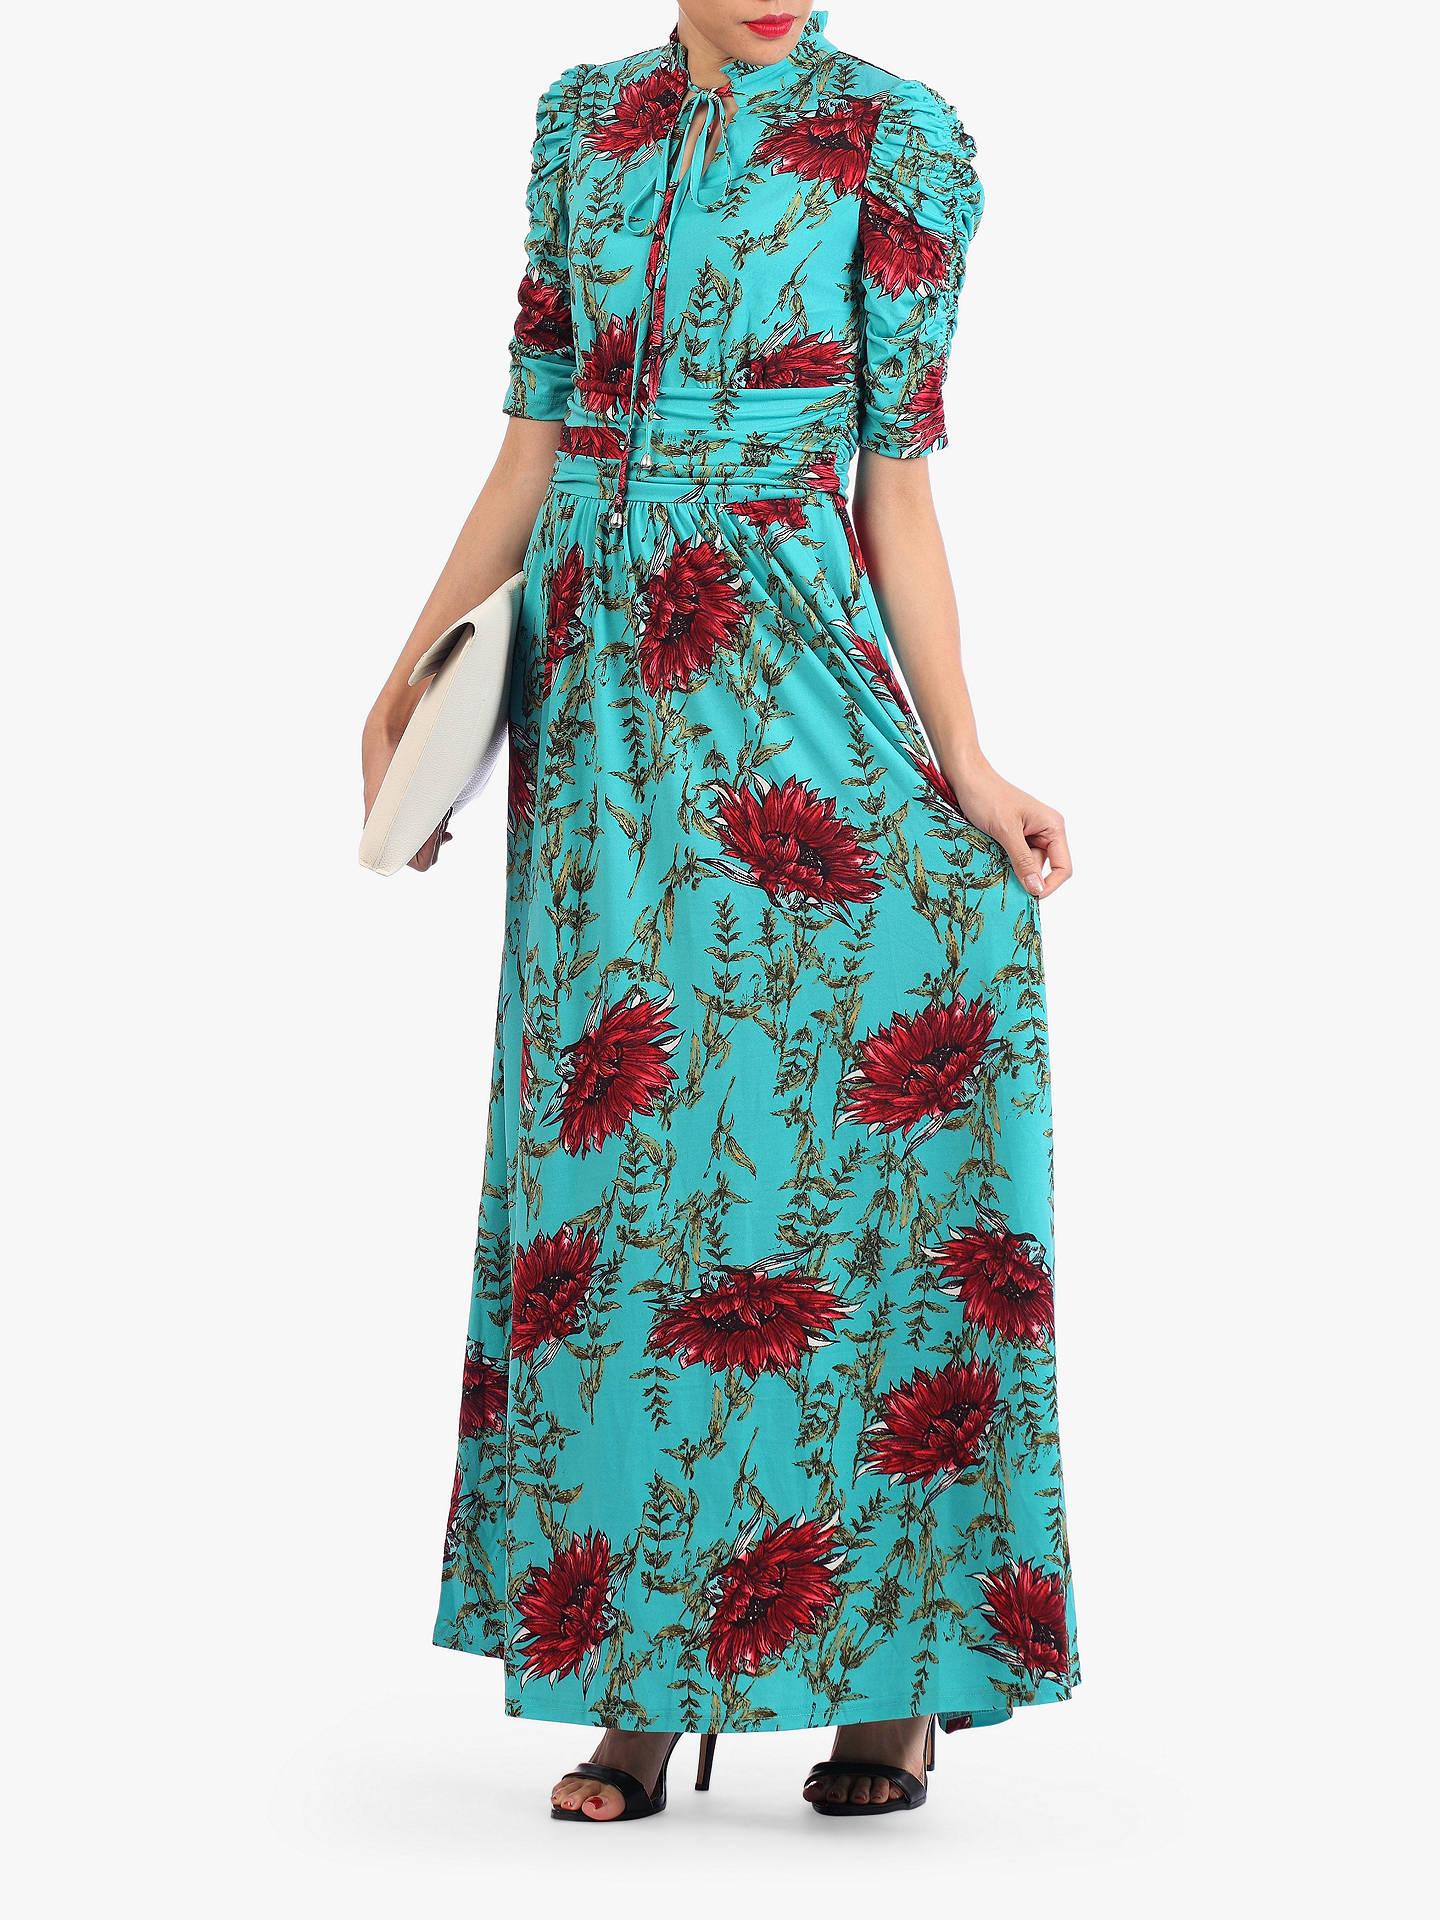 044631a20334 ... Buy Jolie Moi Tie Collar Floral Maxi Dress